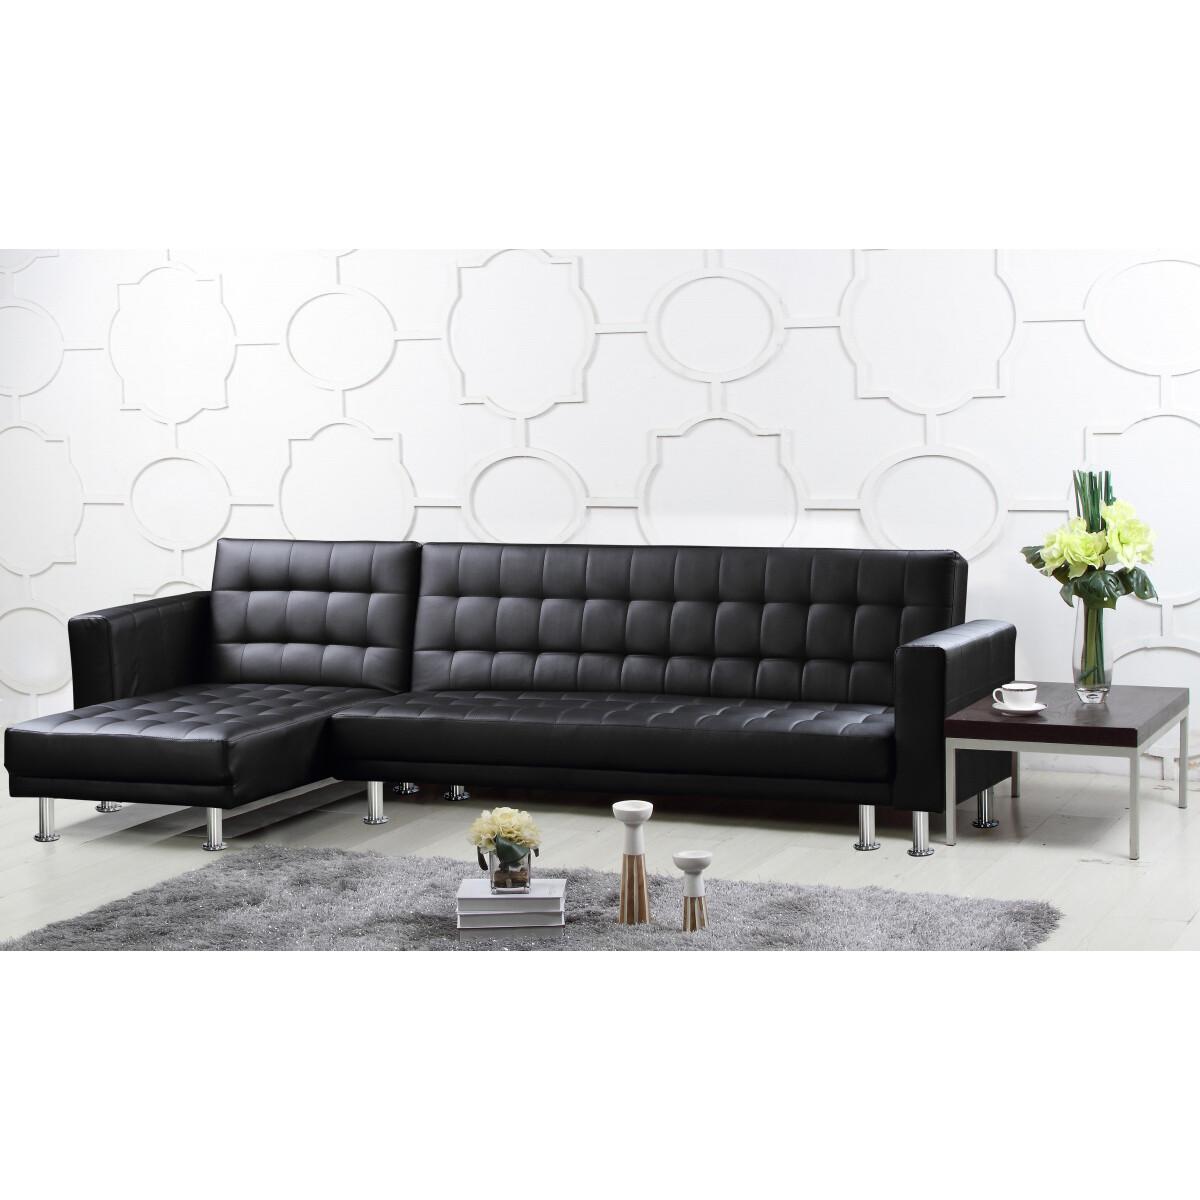 Hawthorne multifunction sofa/chaise